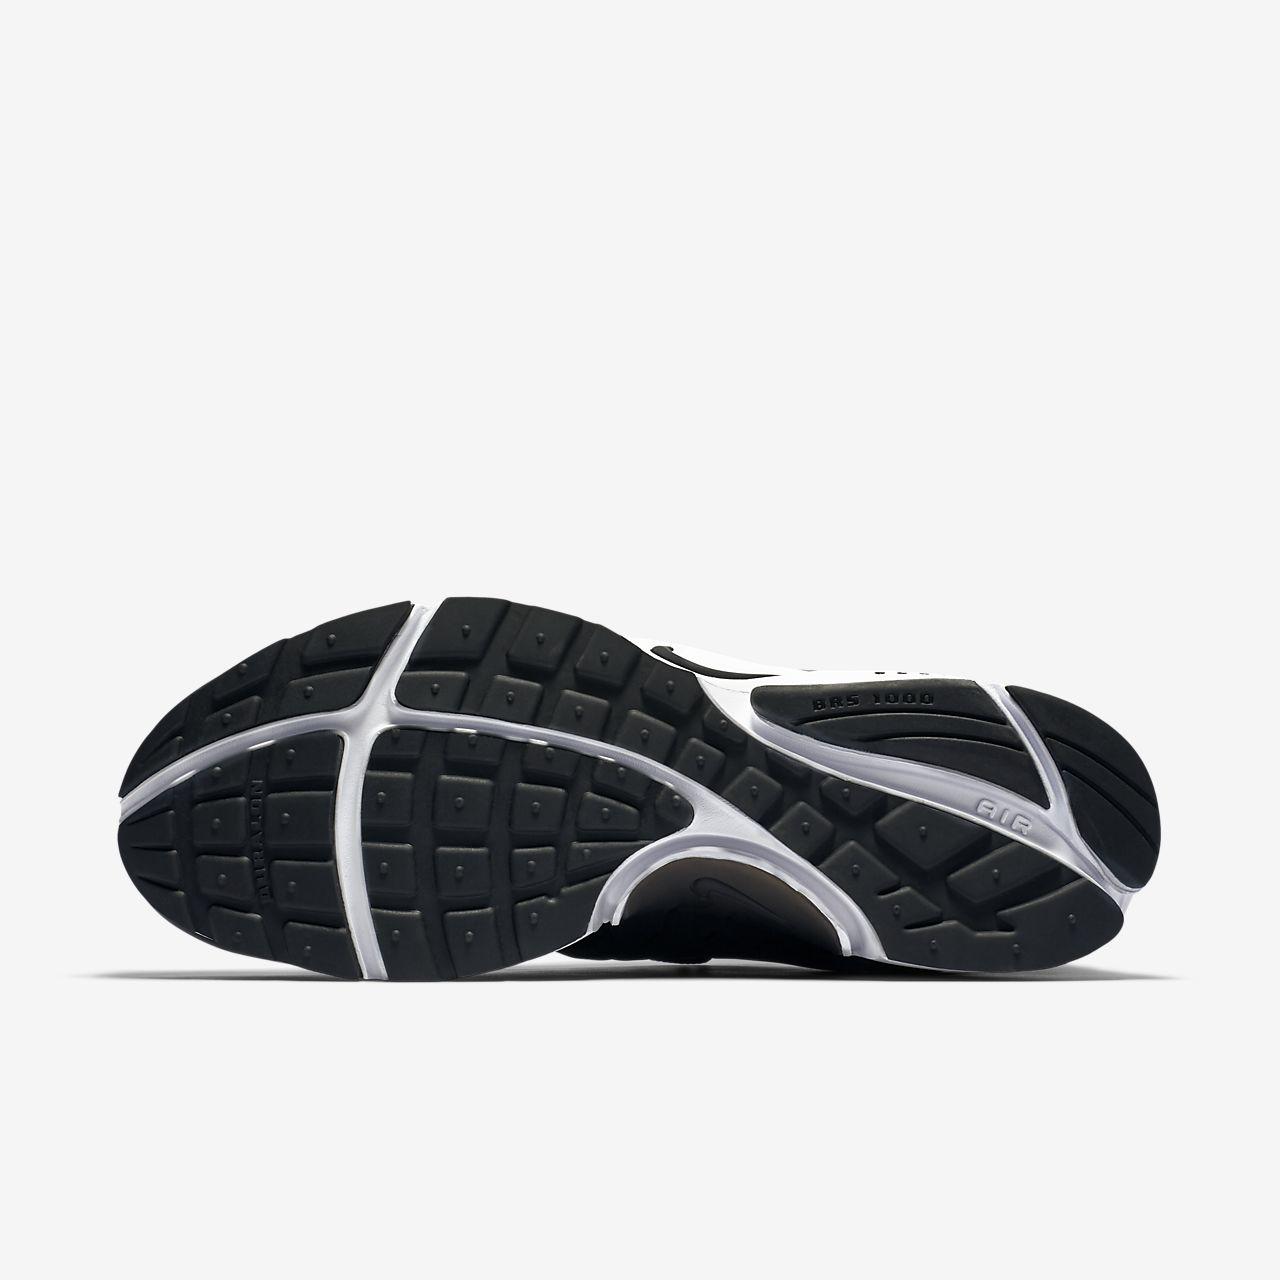 Nike Air Presto Essential Men's